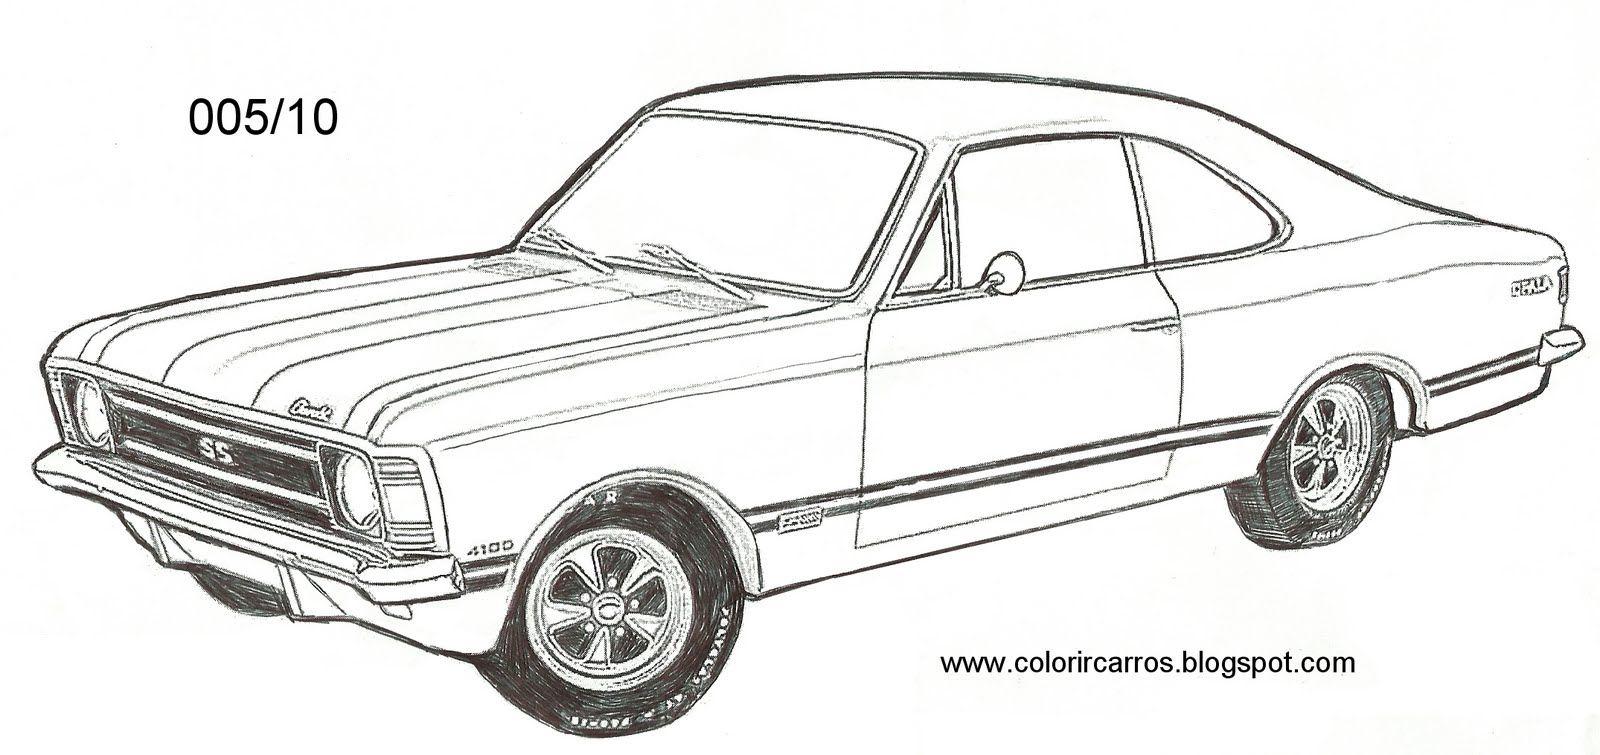 desenhos para colorir desenhos para colorir antigos 5